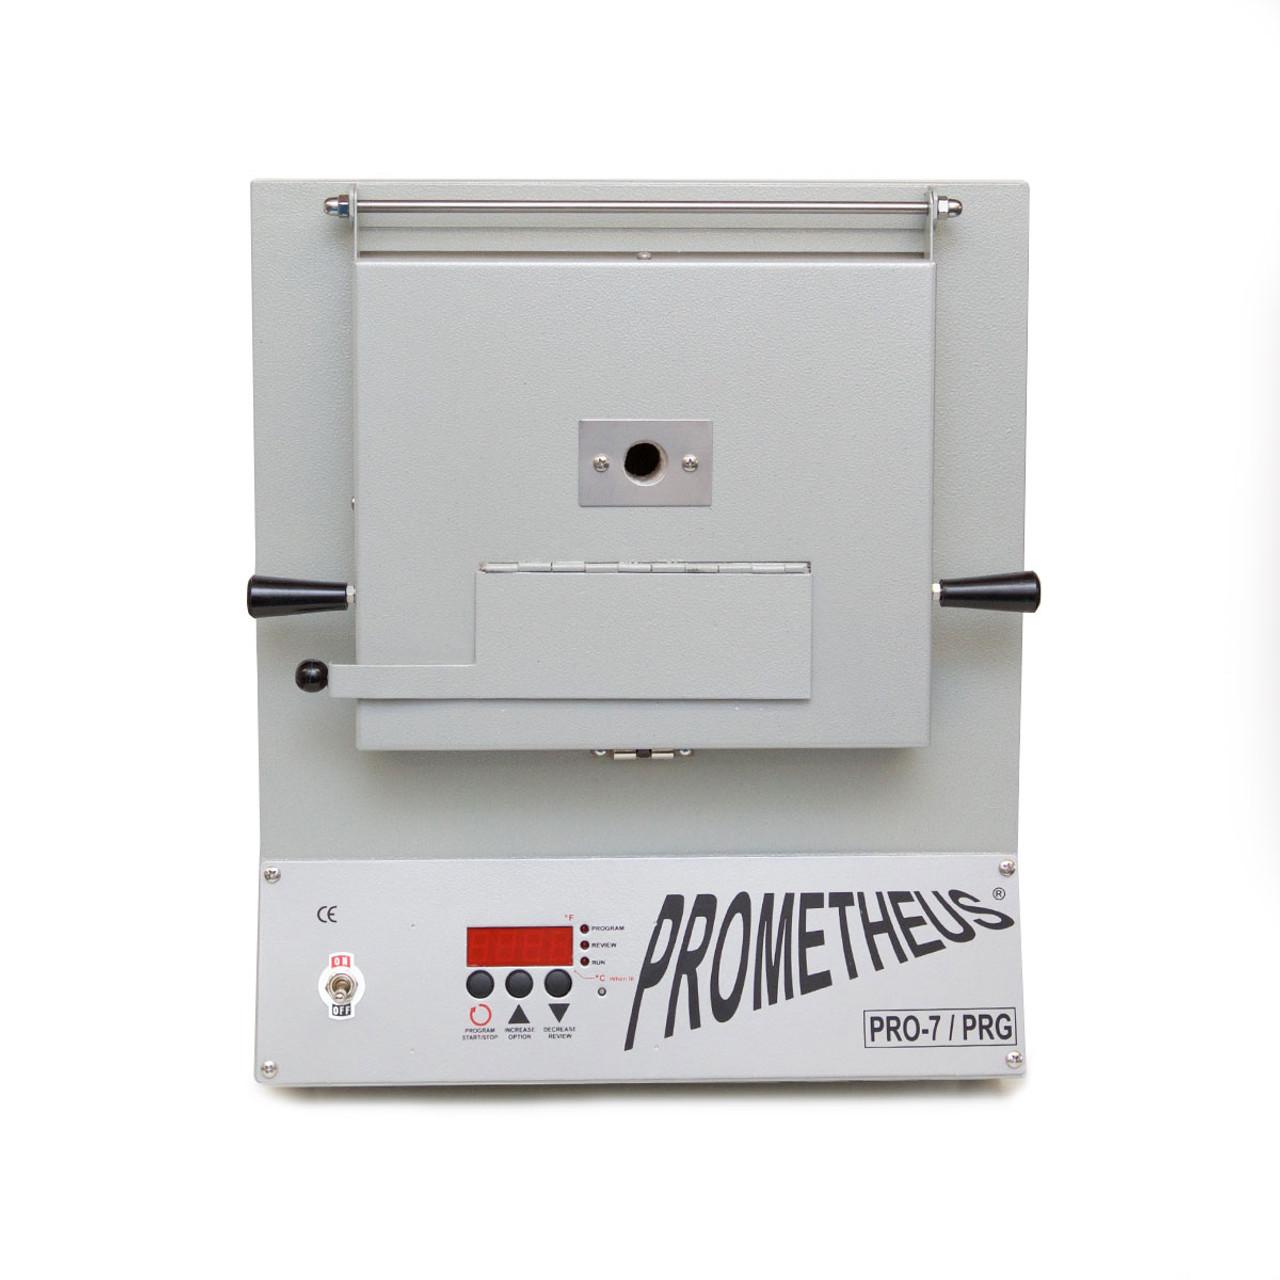 Prometheus 7 Pre-programmed Kiln PRO7 PRG with Bead Door